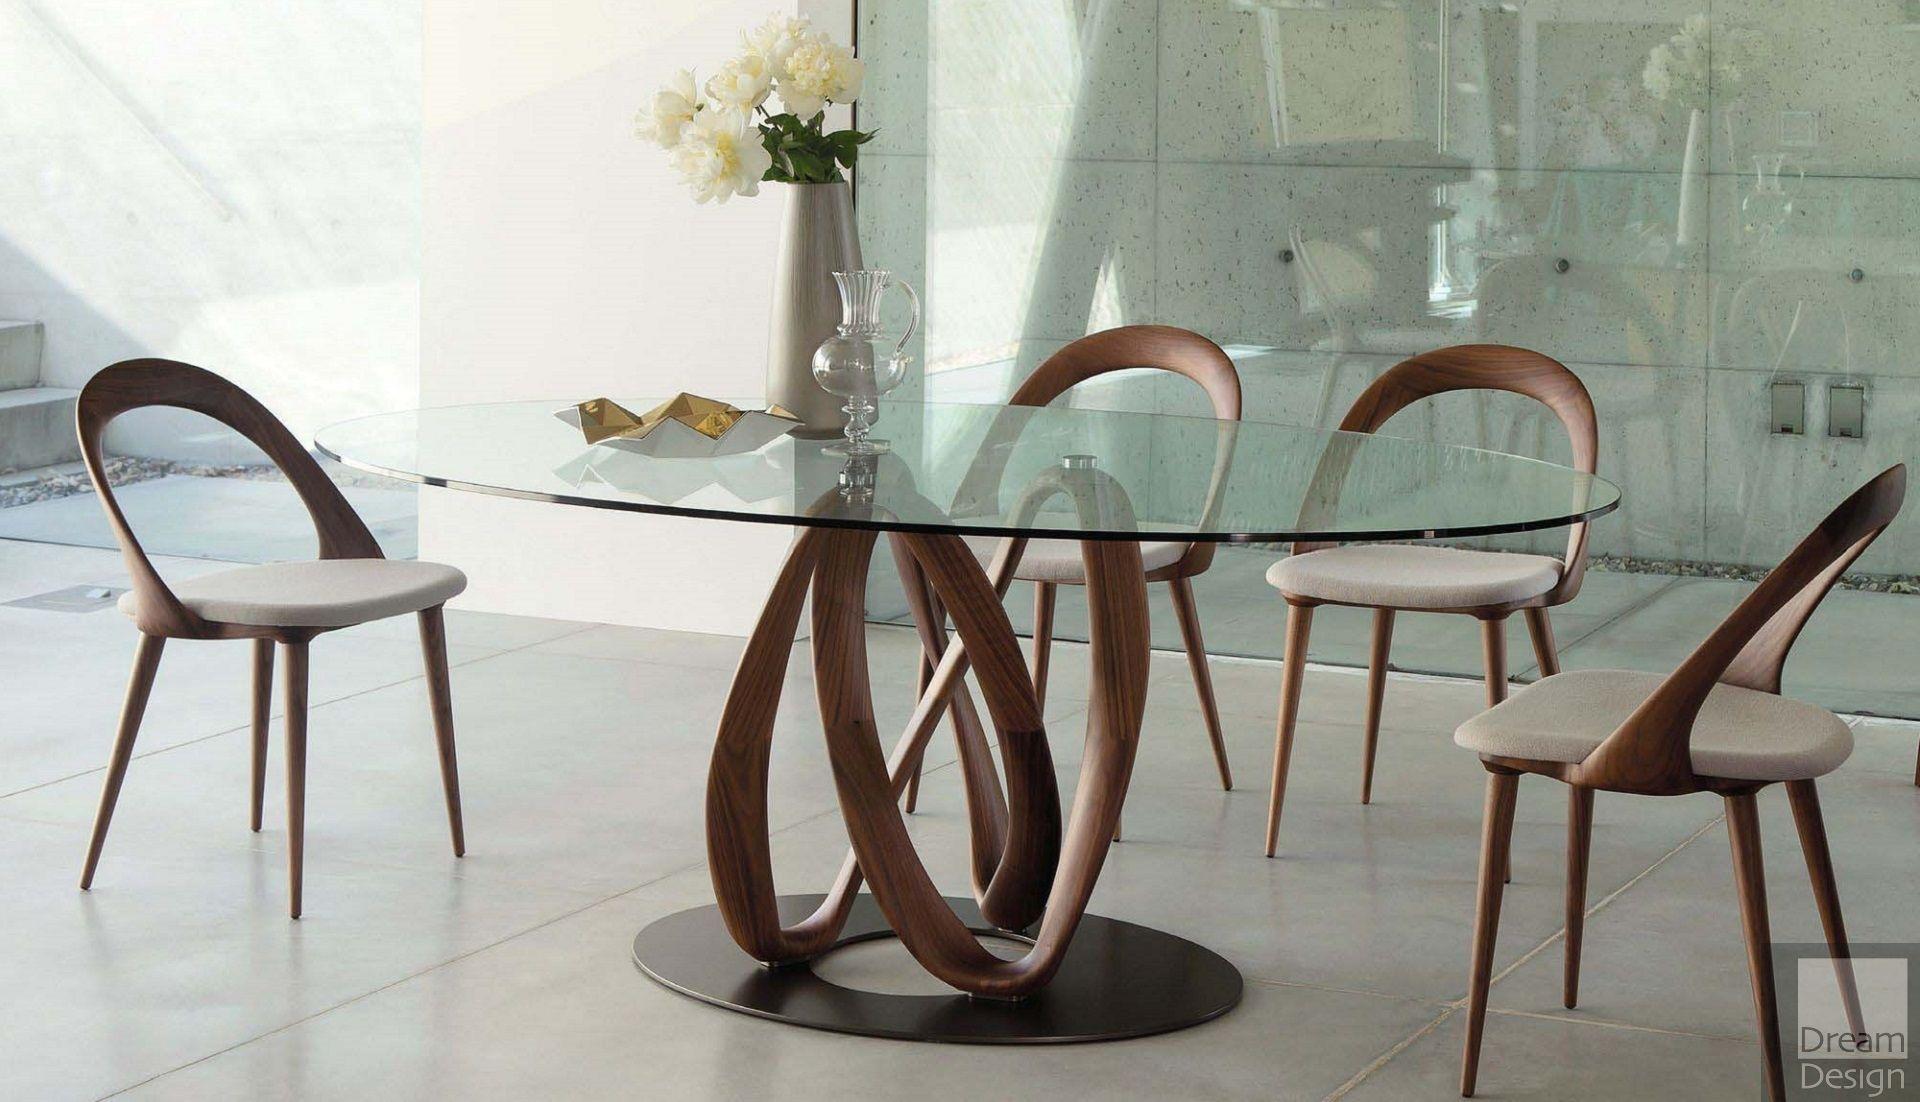 Porada Infinity Elliptic Glass Table Everything But Ordinary